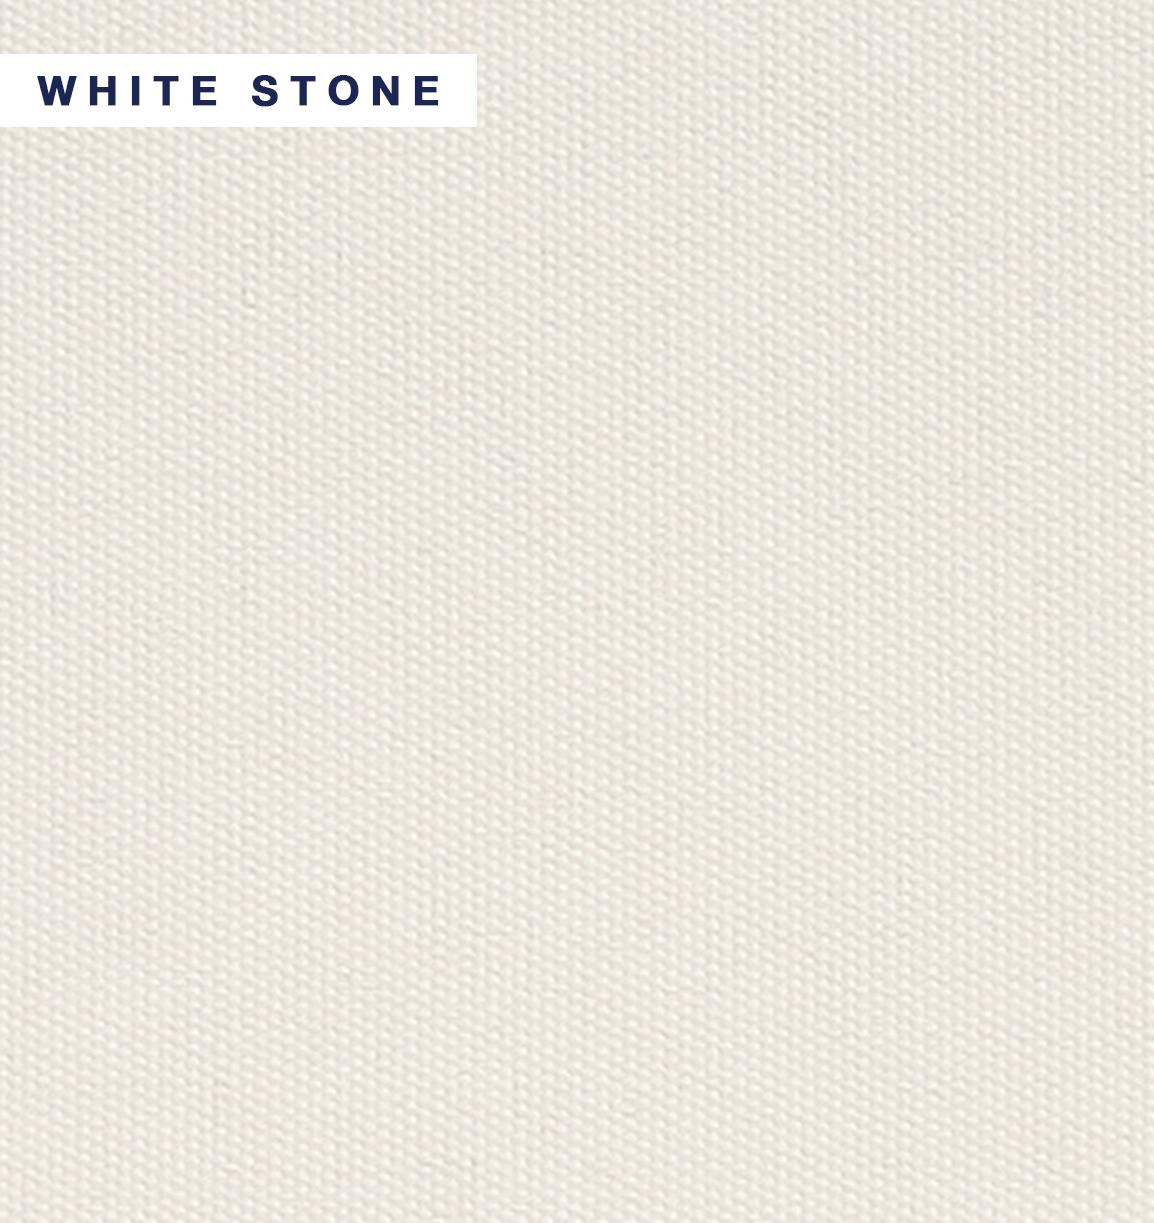 Vivid - White Stone.jpg